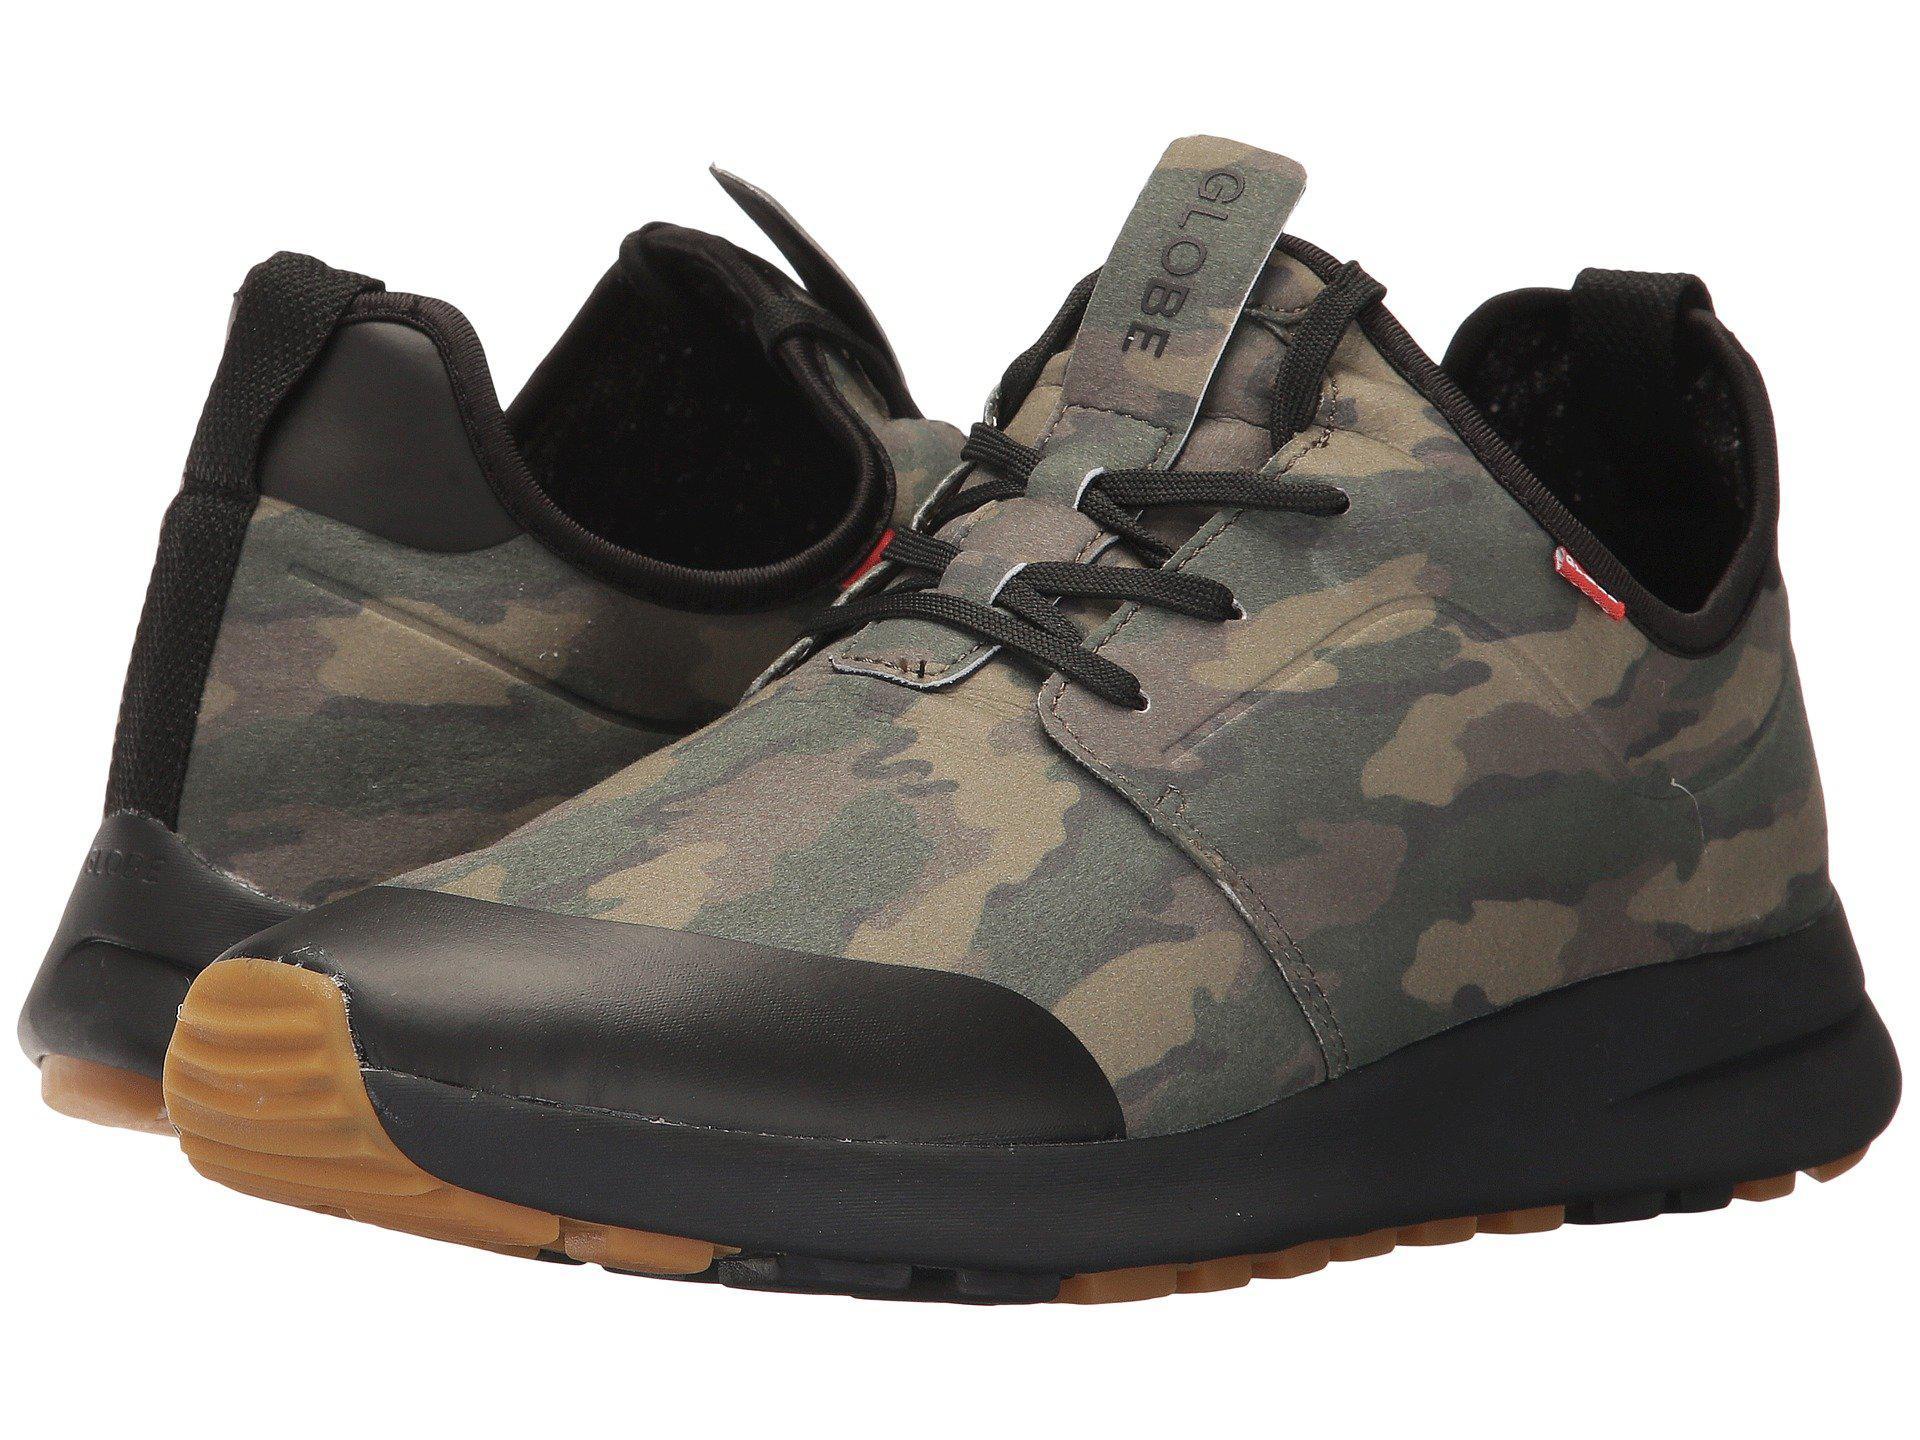 new arrival c09e2 c5946 Men's Dart Lyte Xc (camo) Lace Up Casual Shoes